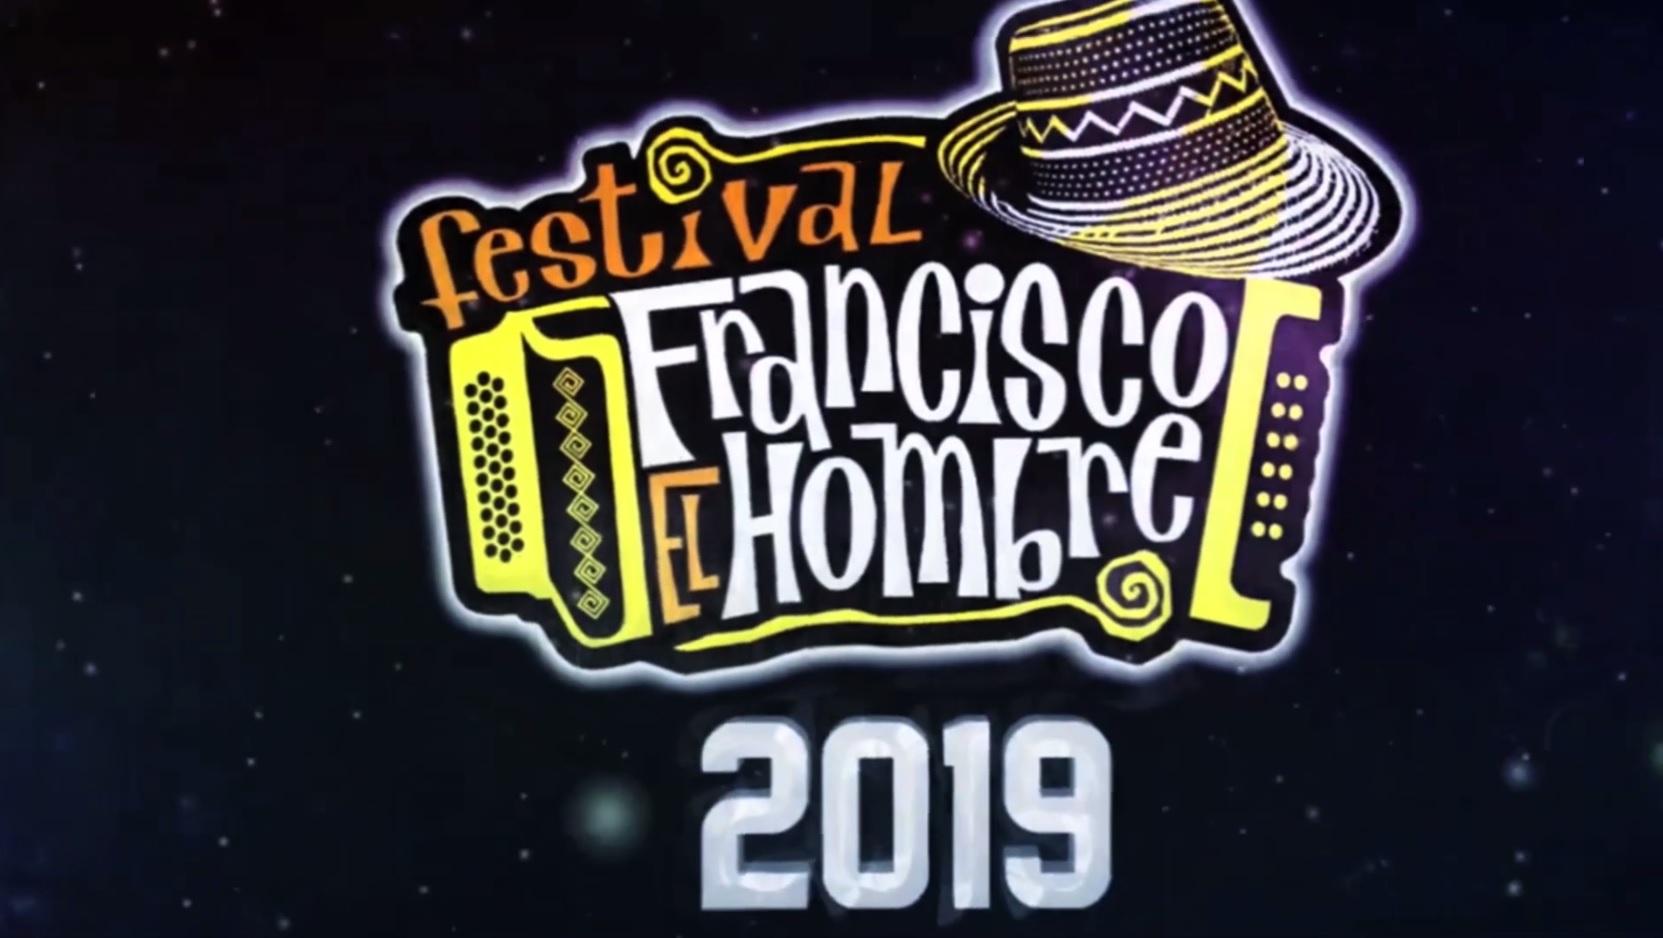 festival-francisco-el-hombre-2019.jpg